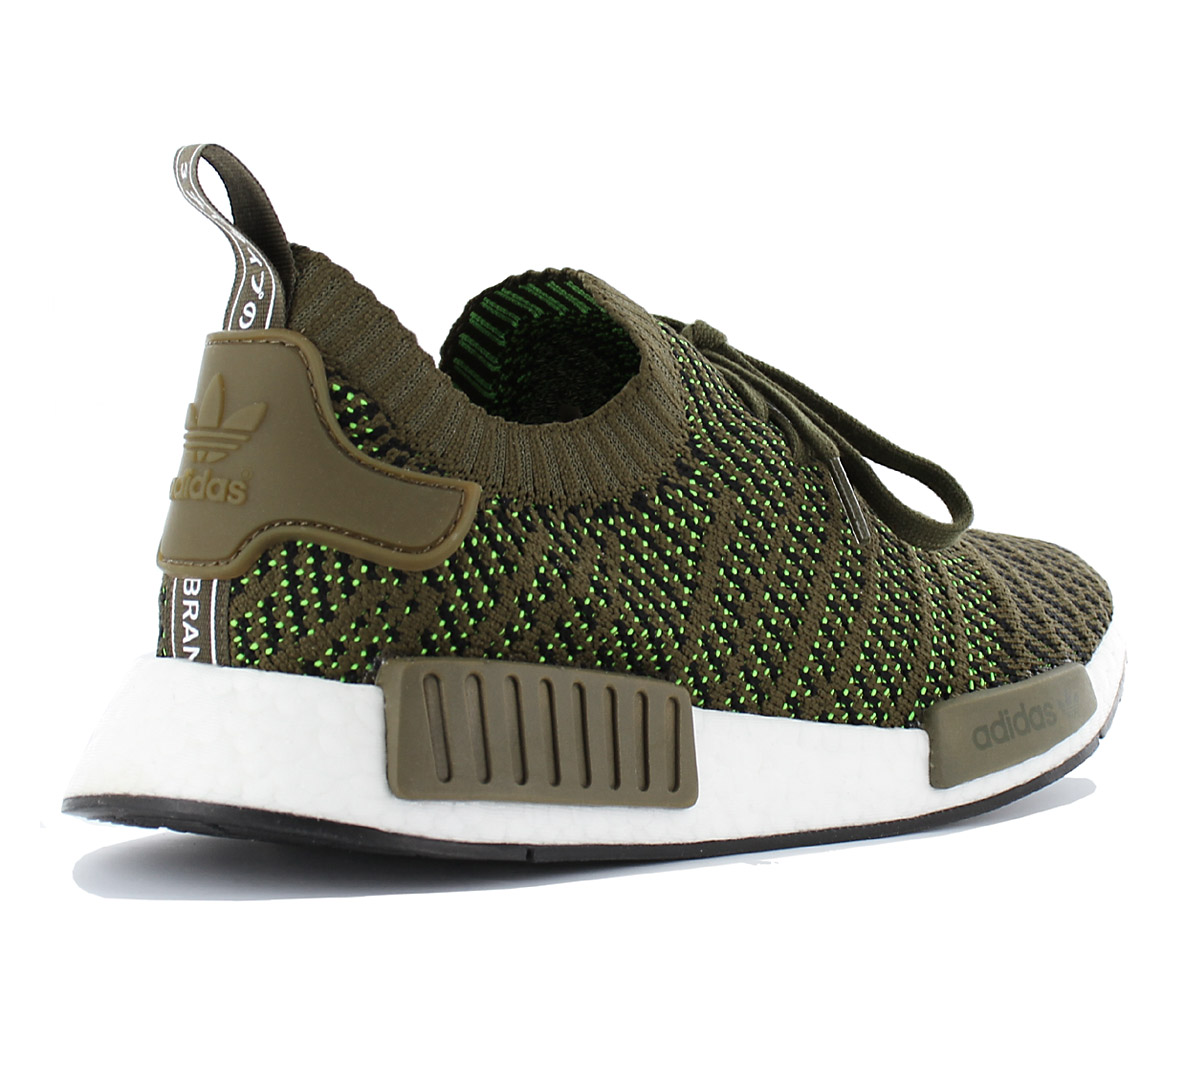 official photos 909de cd051 Details about Adidas Nmd R1 Stlt Pk Primeknit Men's Boost Sneaker Shoes  Olive Green CQ2389 New